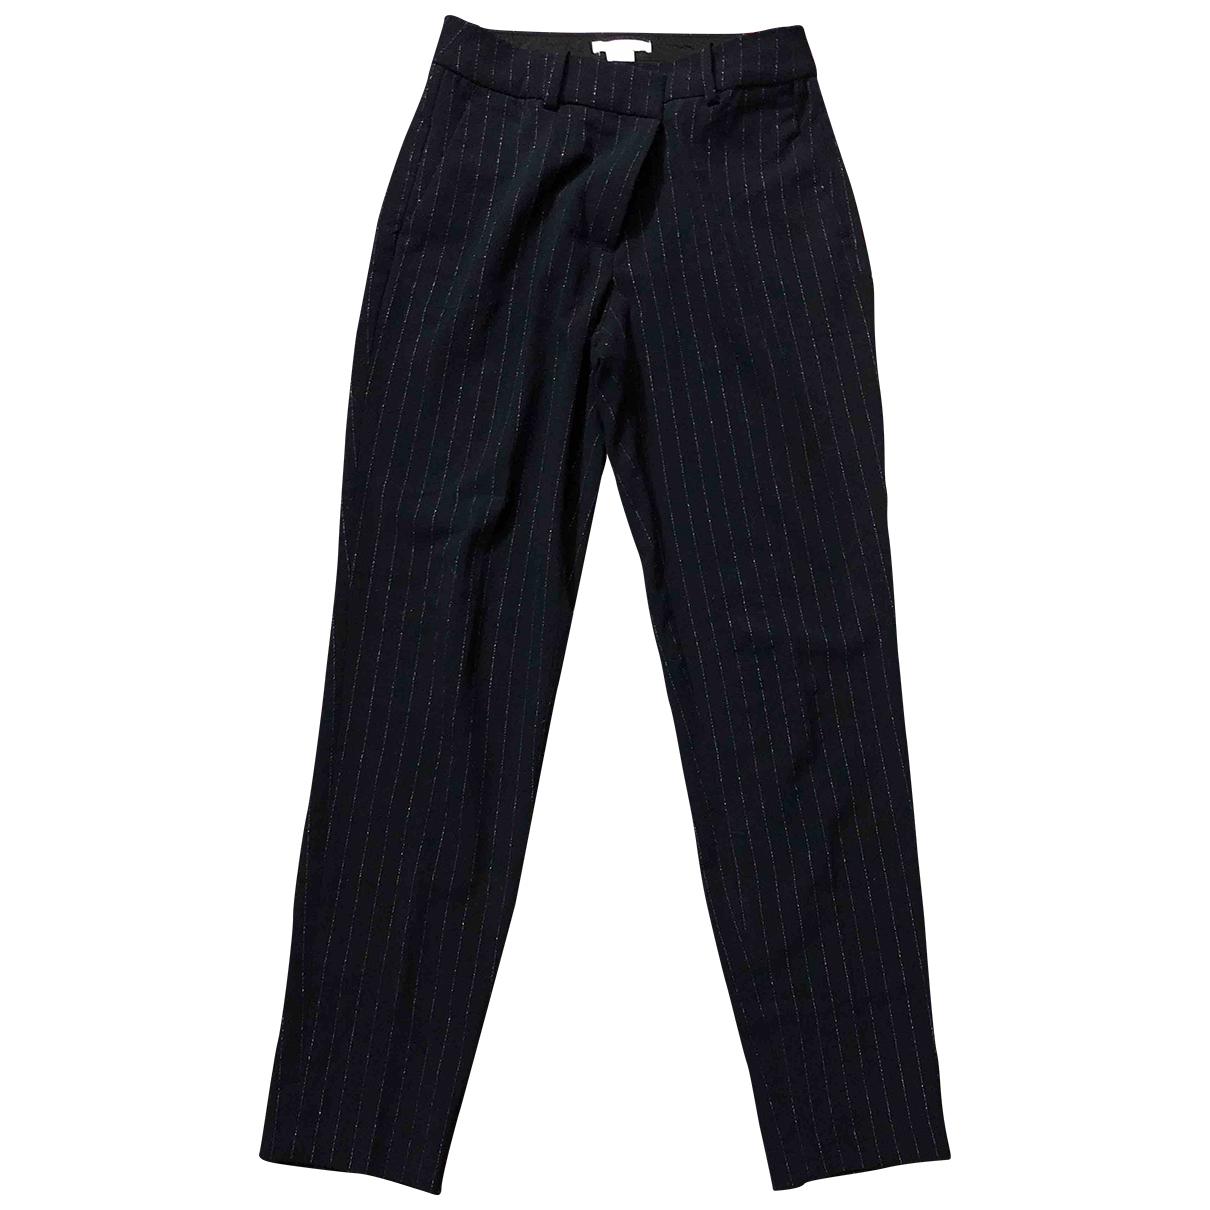 H&m Studio - Pantalon   pour femme - bleu